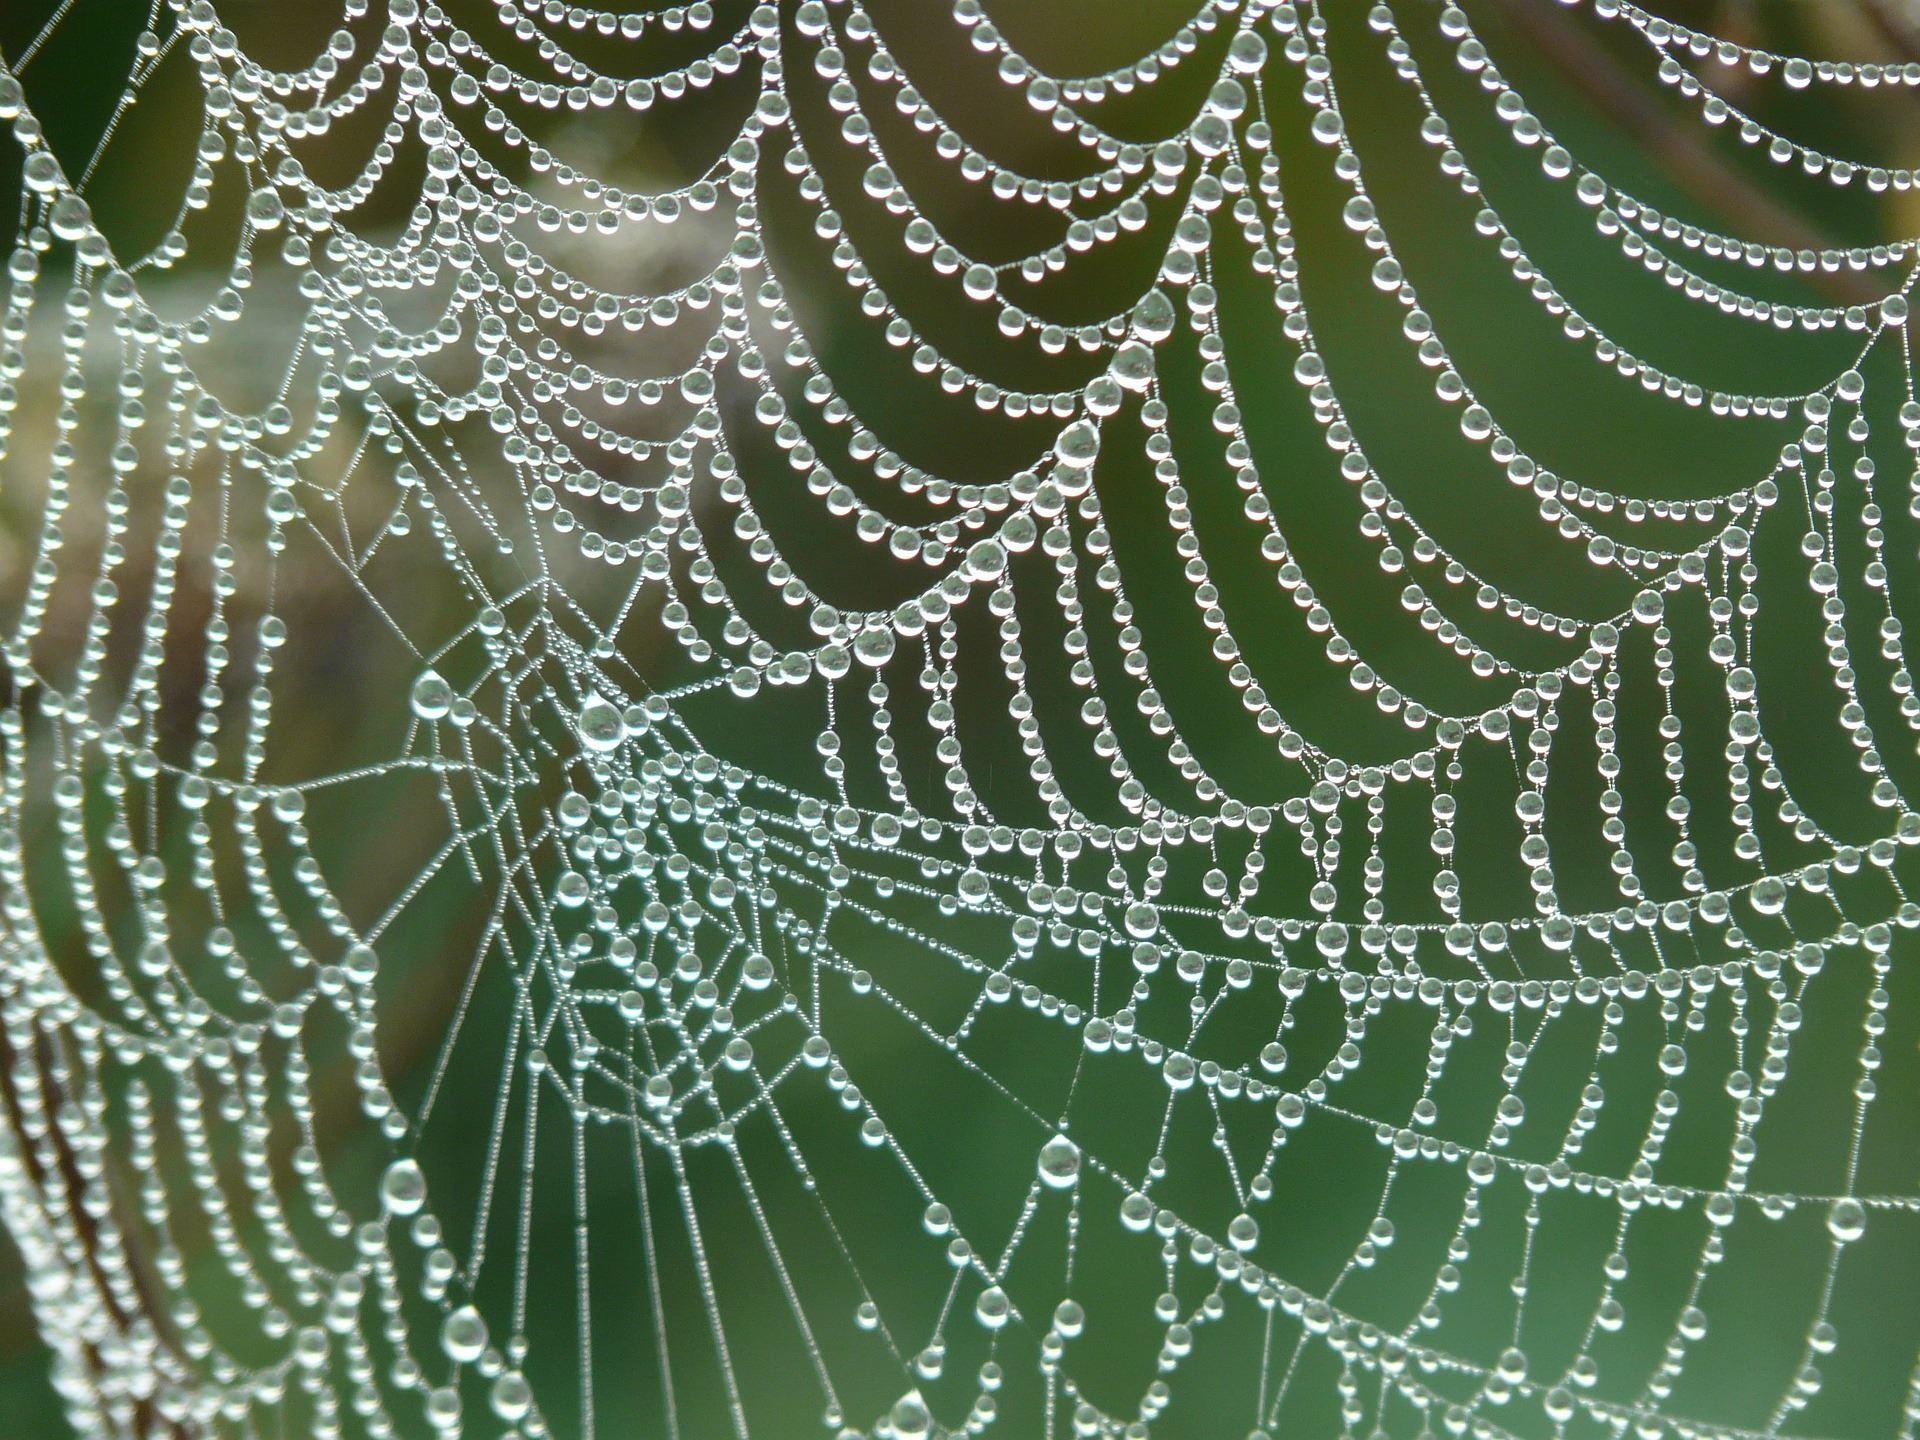 Imse Vimse spindel i Åsnens nationalpark